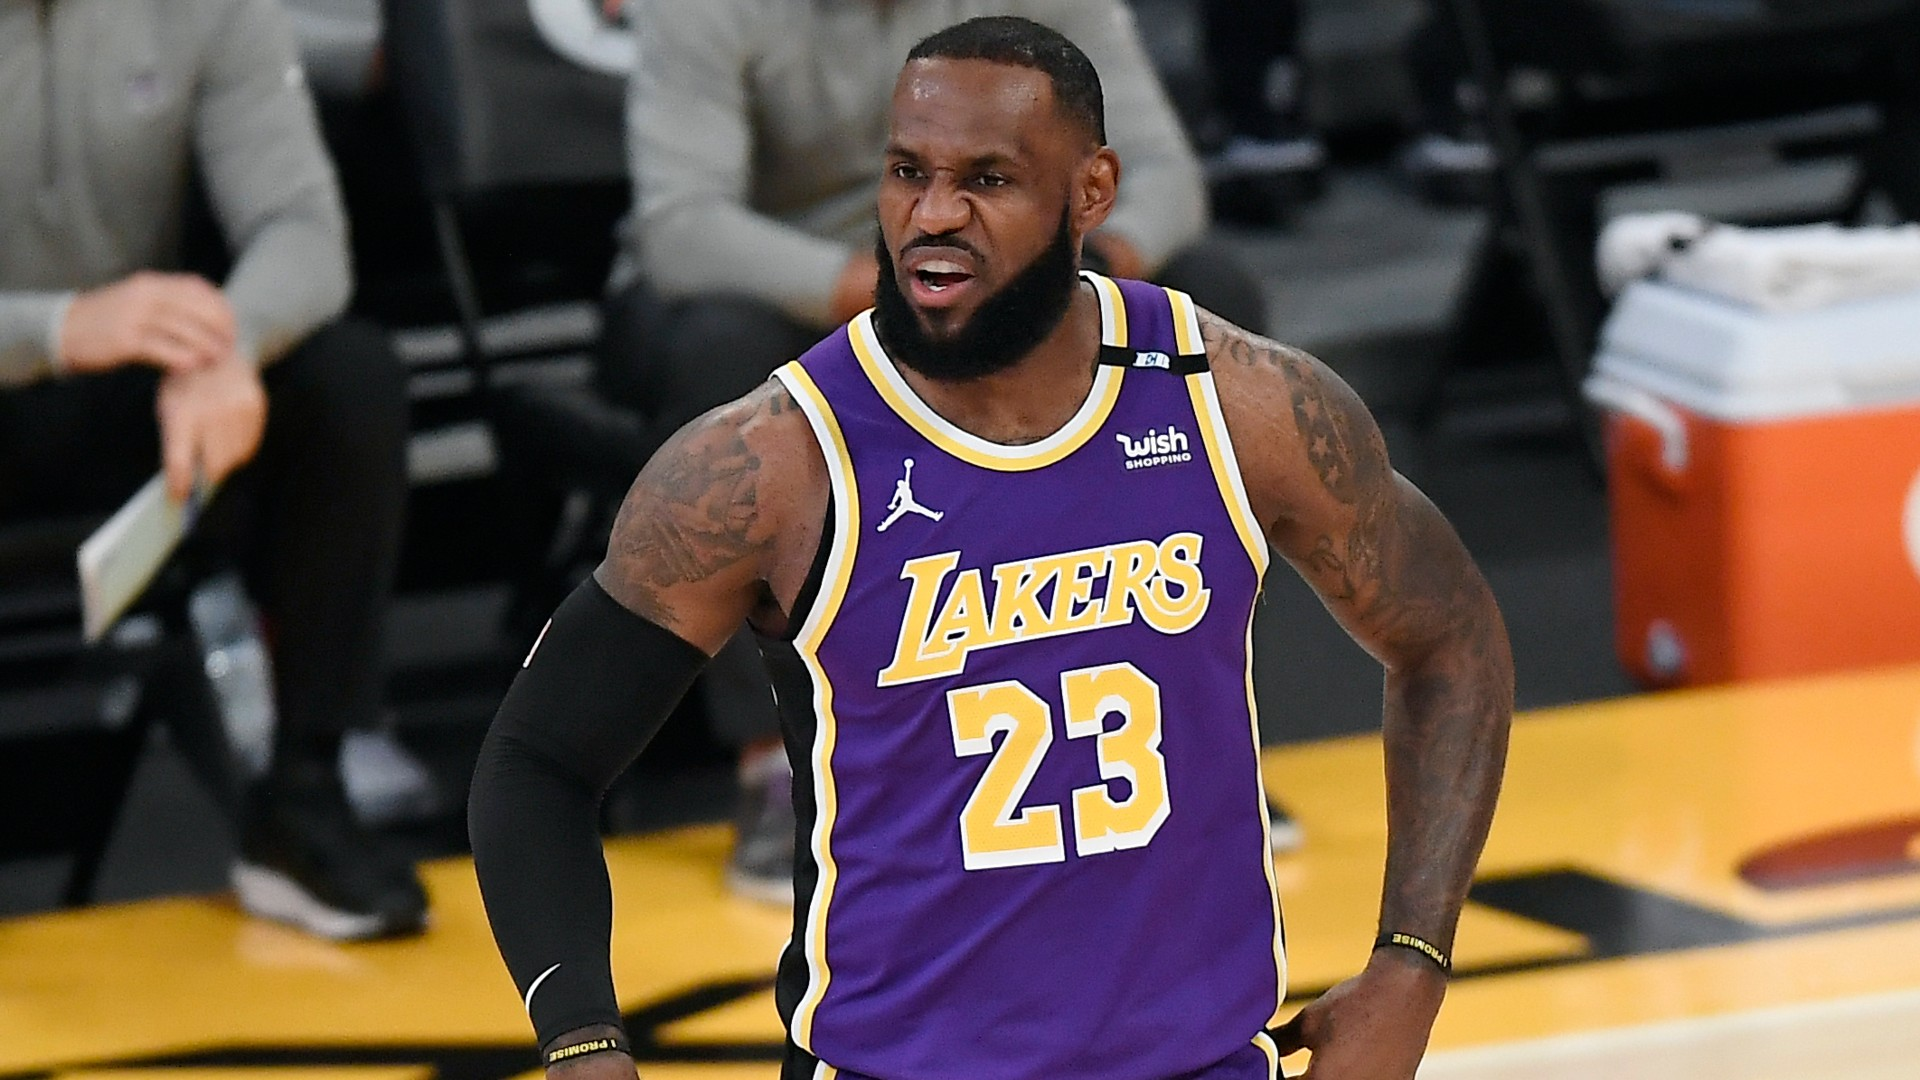 LeBron James rails against NBA in tweet tirade amid glut of star player injuries in playoffs...